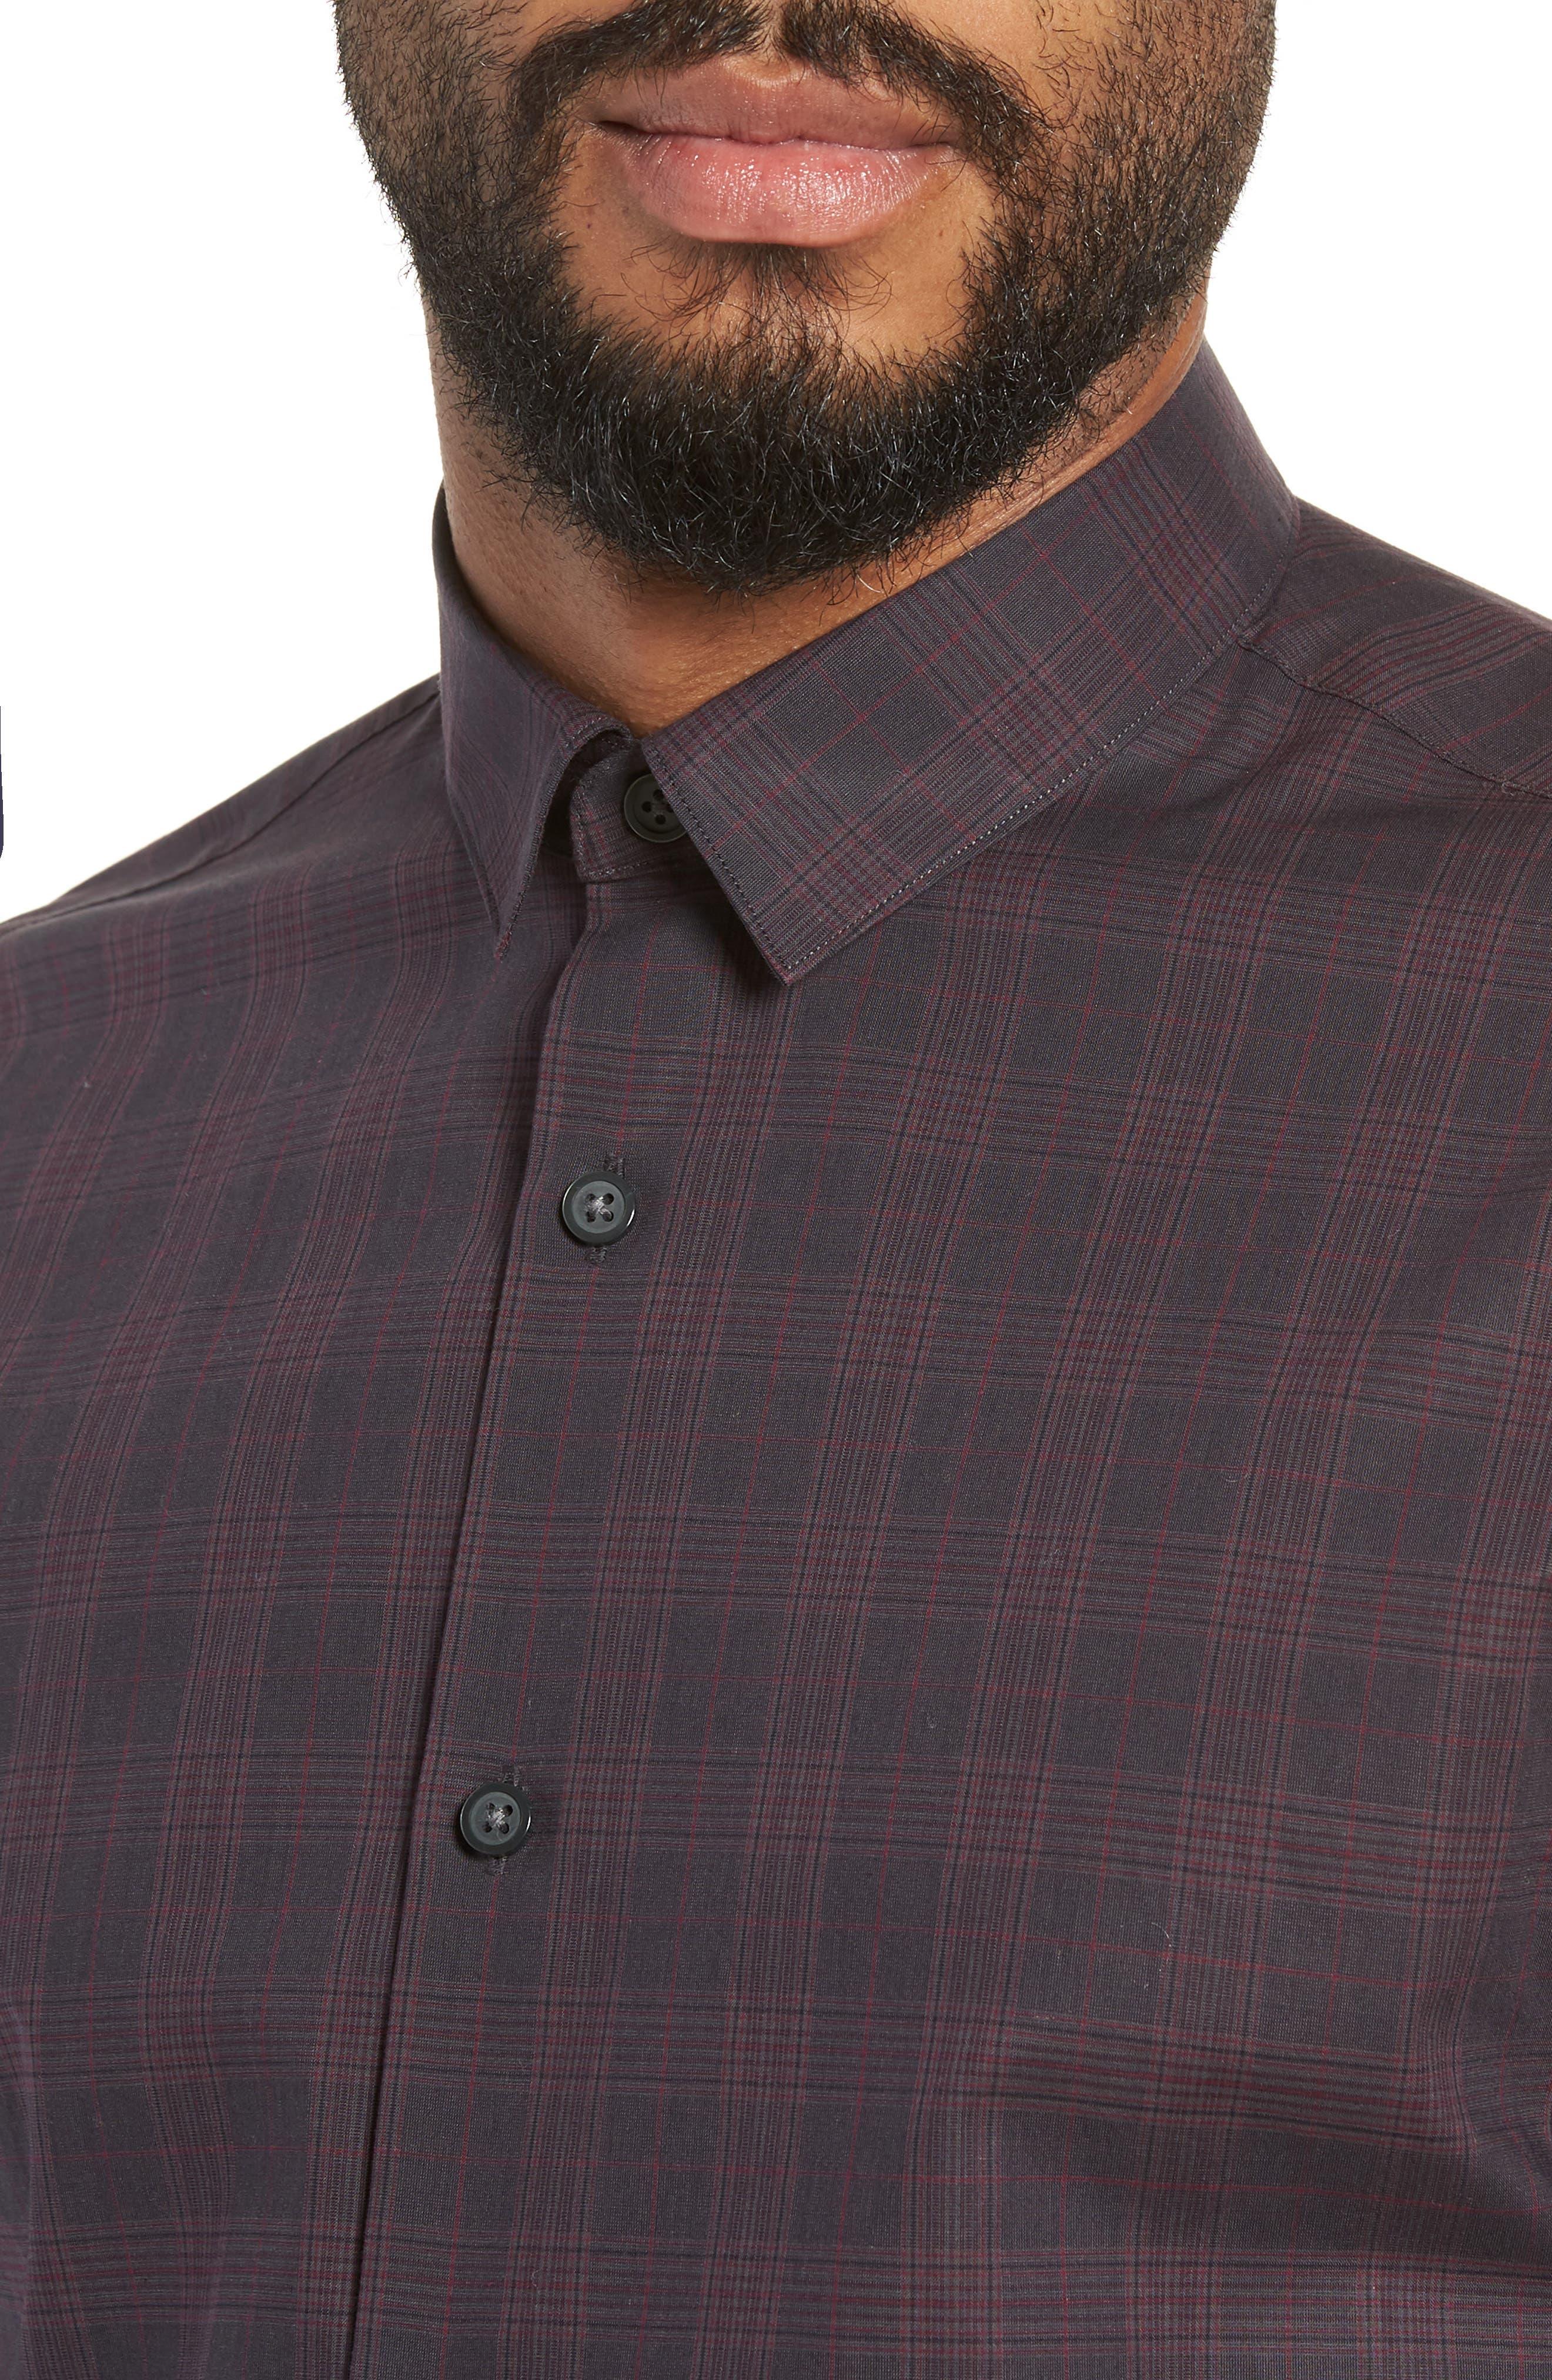 Regaron Regular Fit Check Sport Shirt,                             Alternate thumbnail 2, color,                             GREY